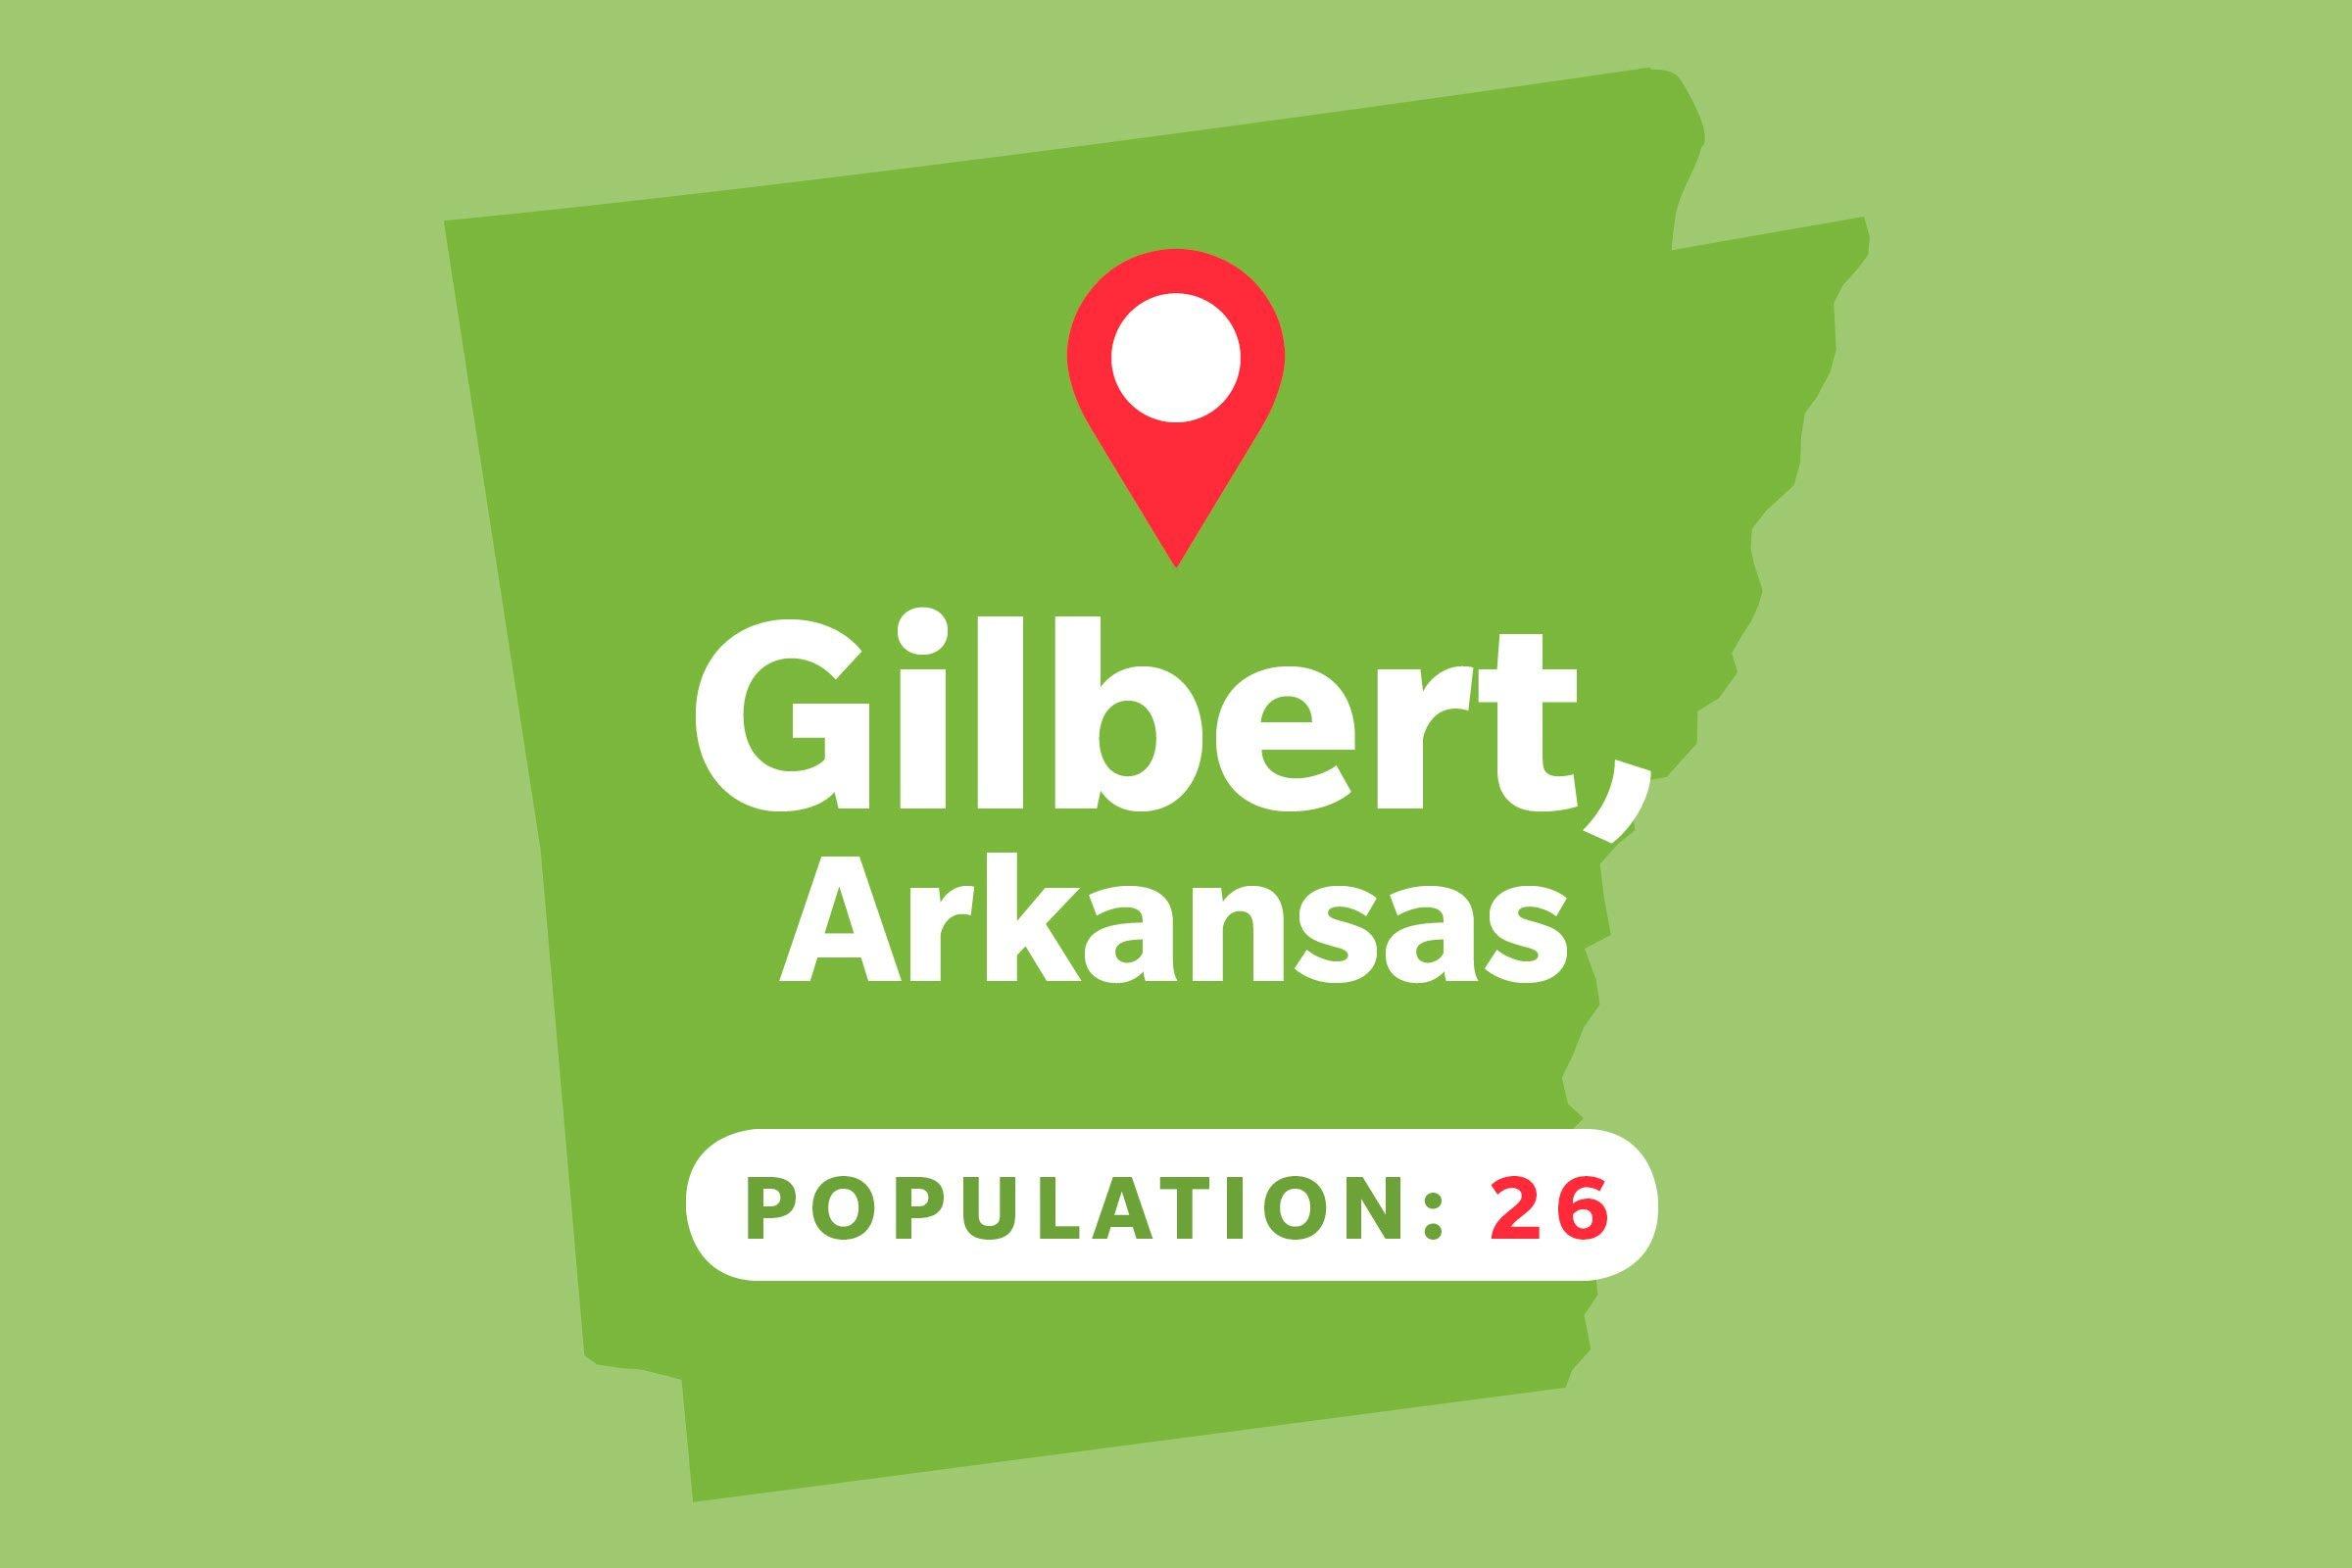 Gilbert, Arkansas